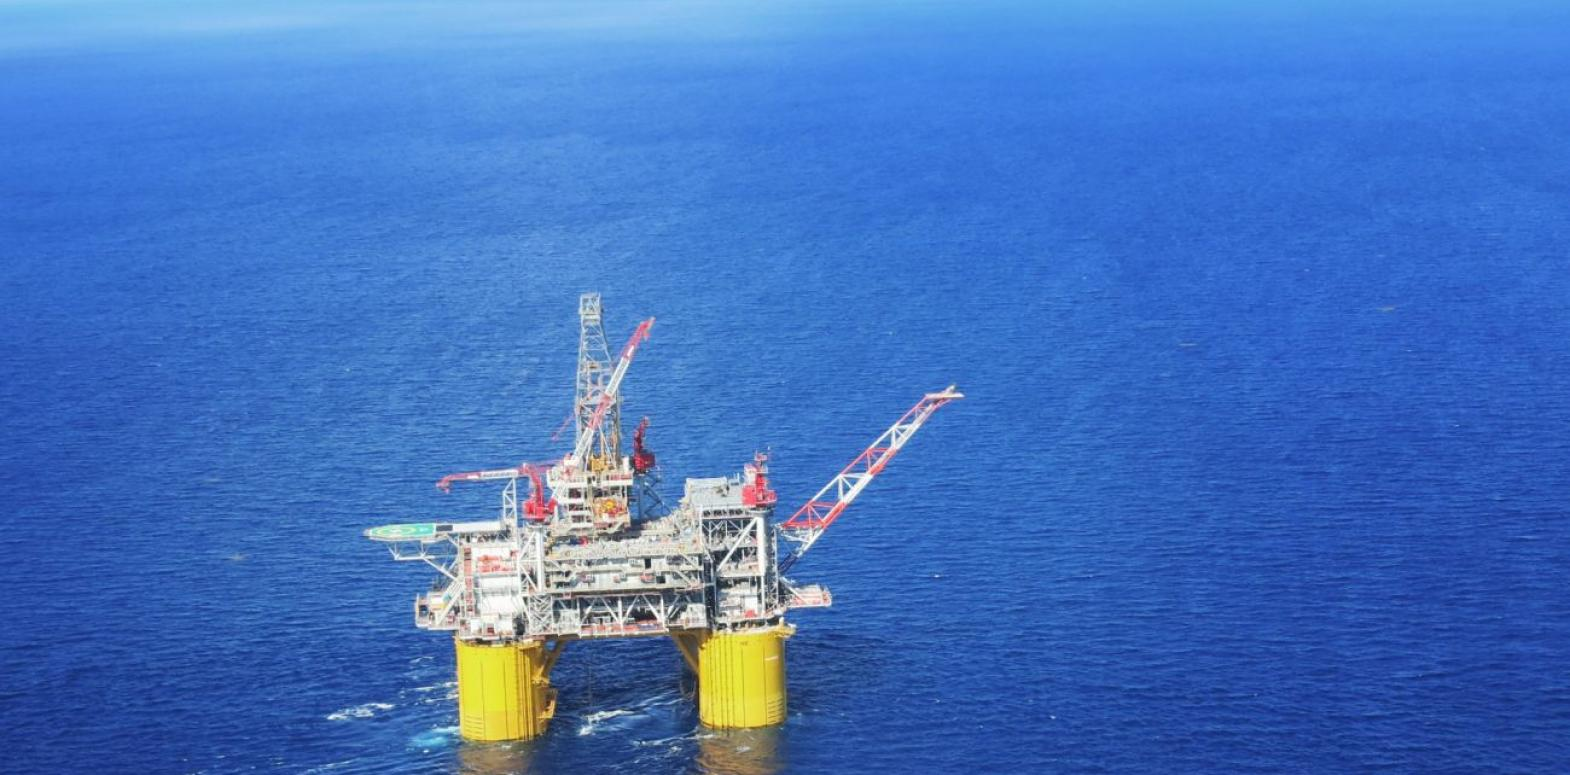 МЭА ухудшило прогноз по нефти на фоне обвала авиаперевозок